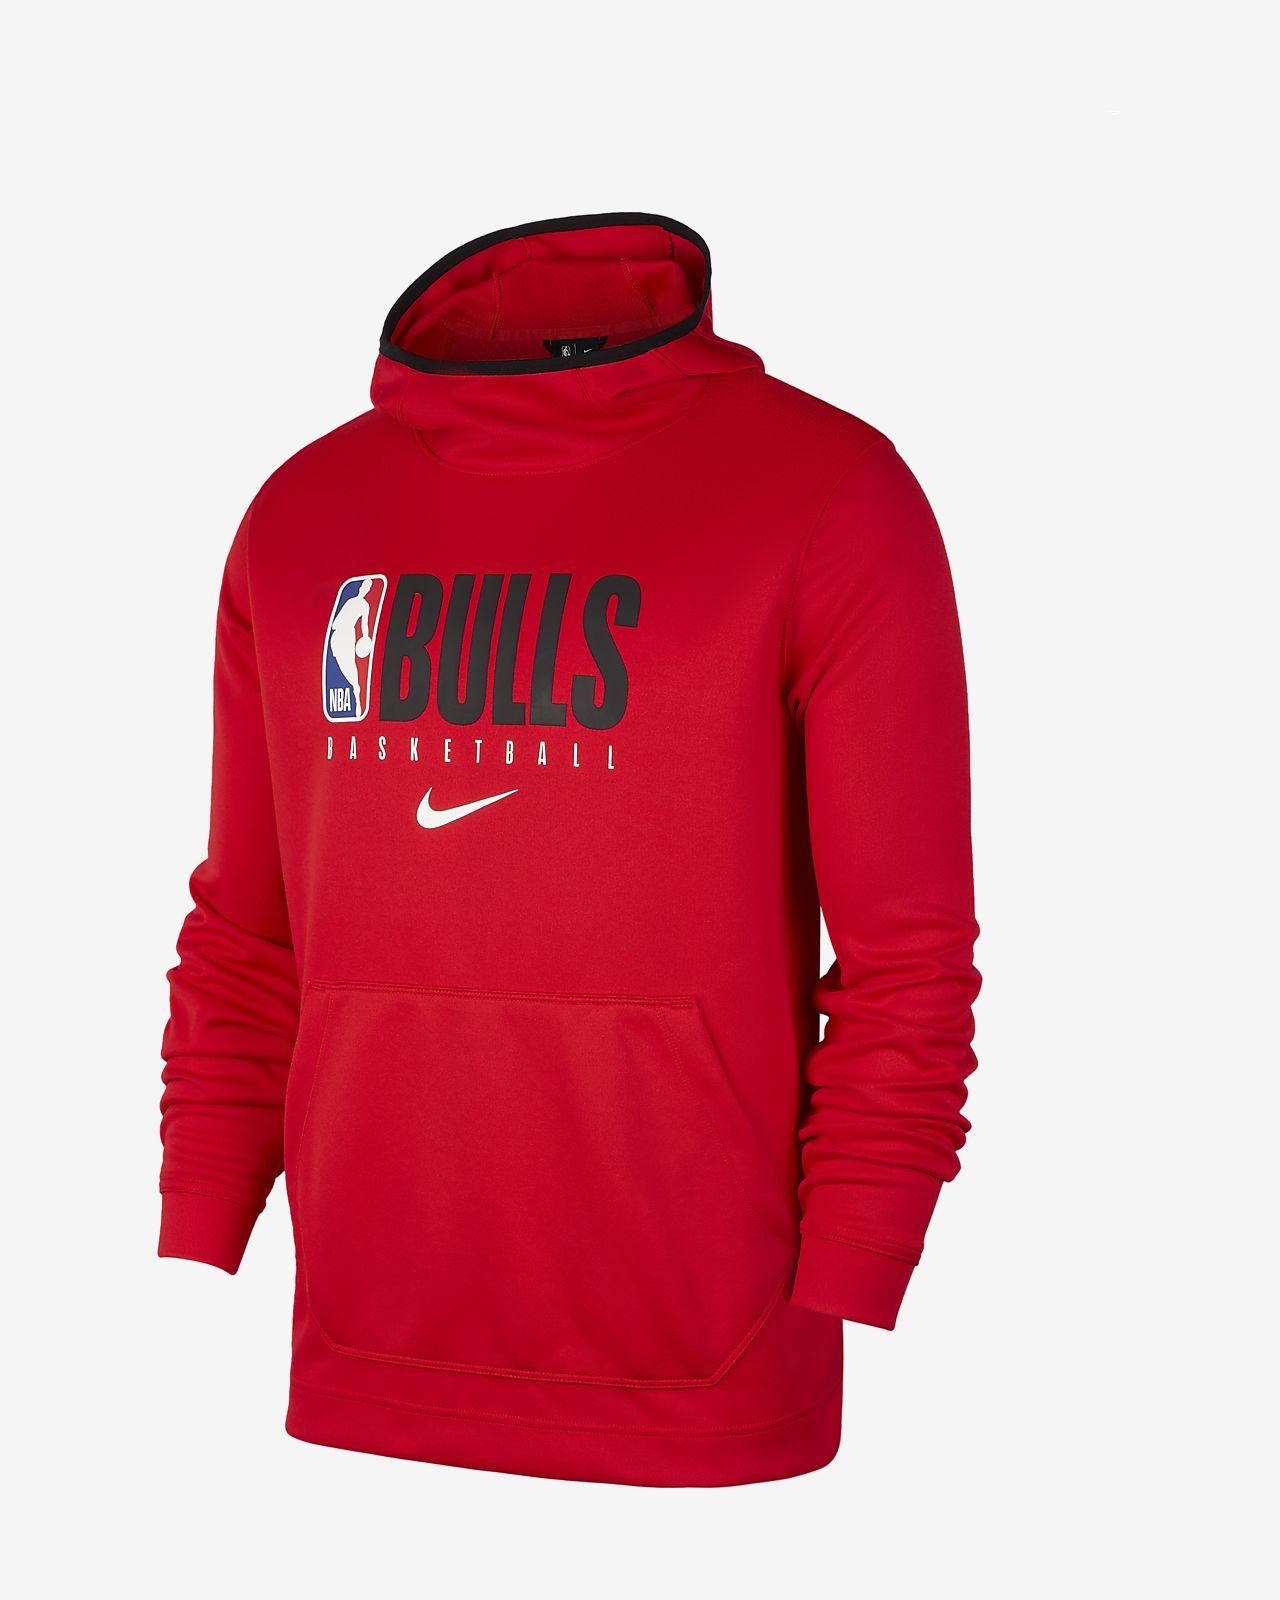 Chicago Bulls Nike Spotlight Sudadera con capucha de la NBA - Hombre